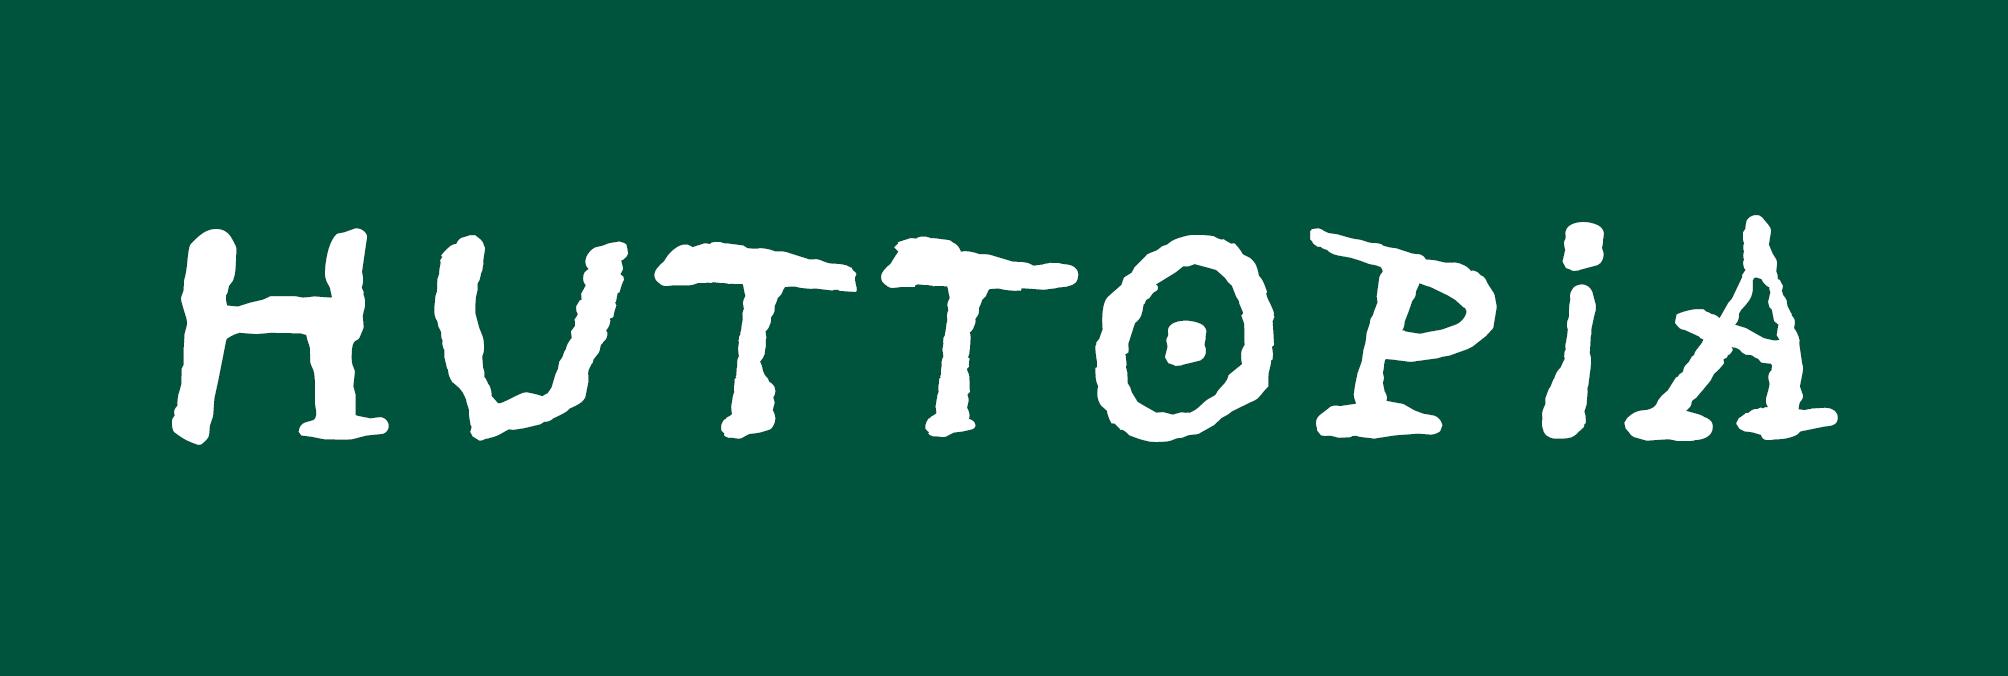 Huttopia Etang de Fouché